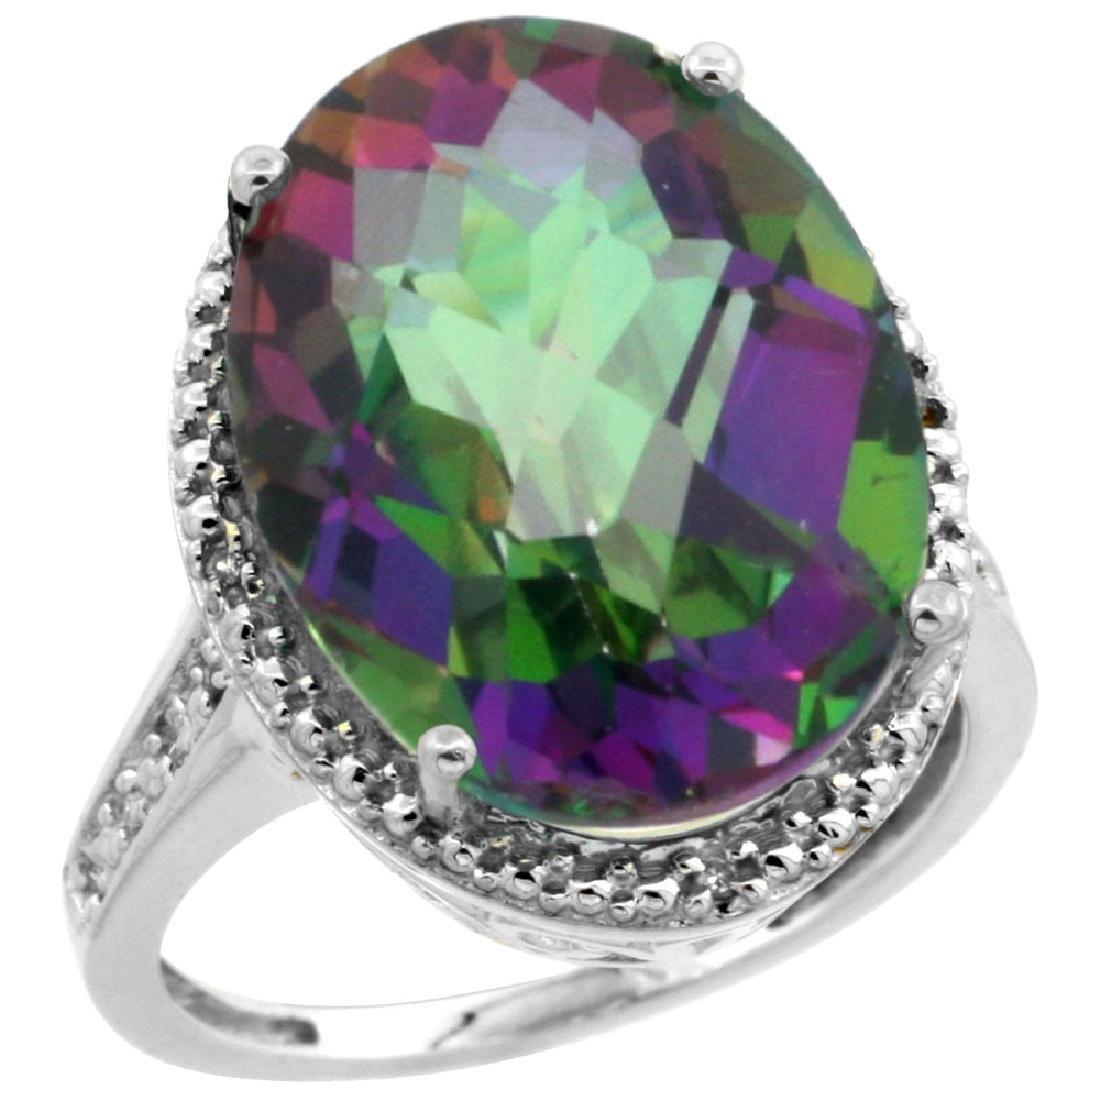 Natural 13.6 ctw Mystic-topaz & Diamond Engagement Ring